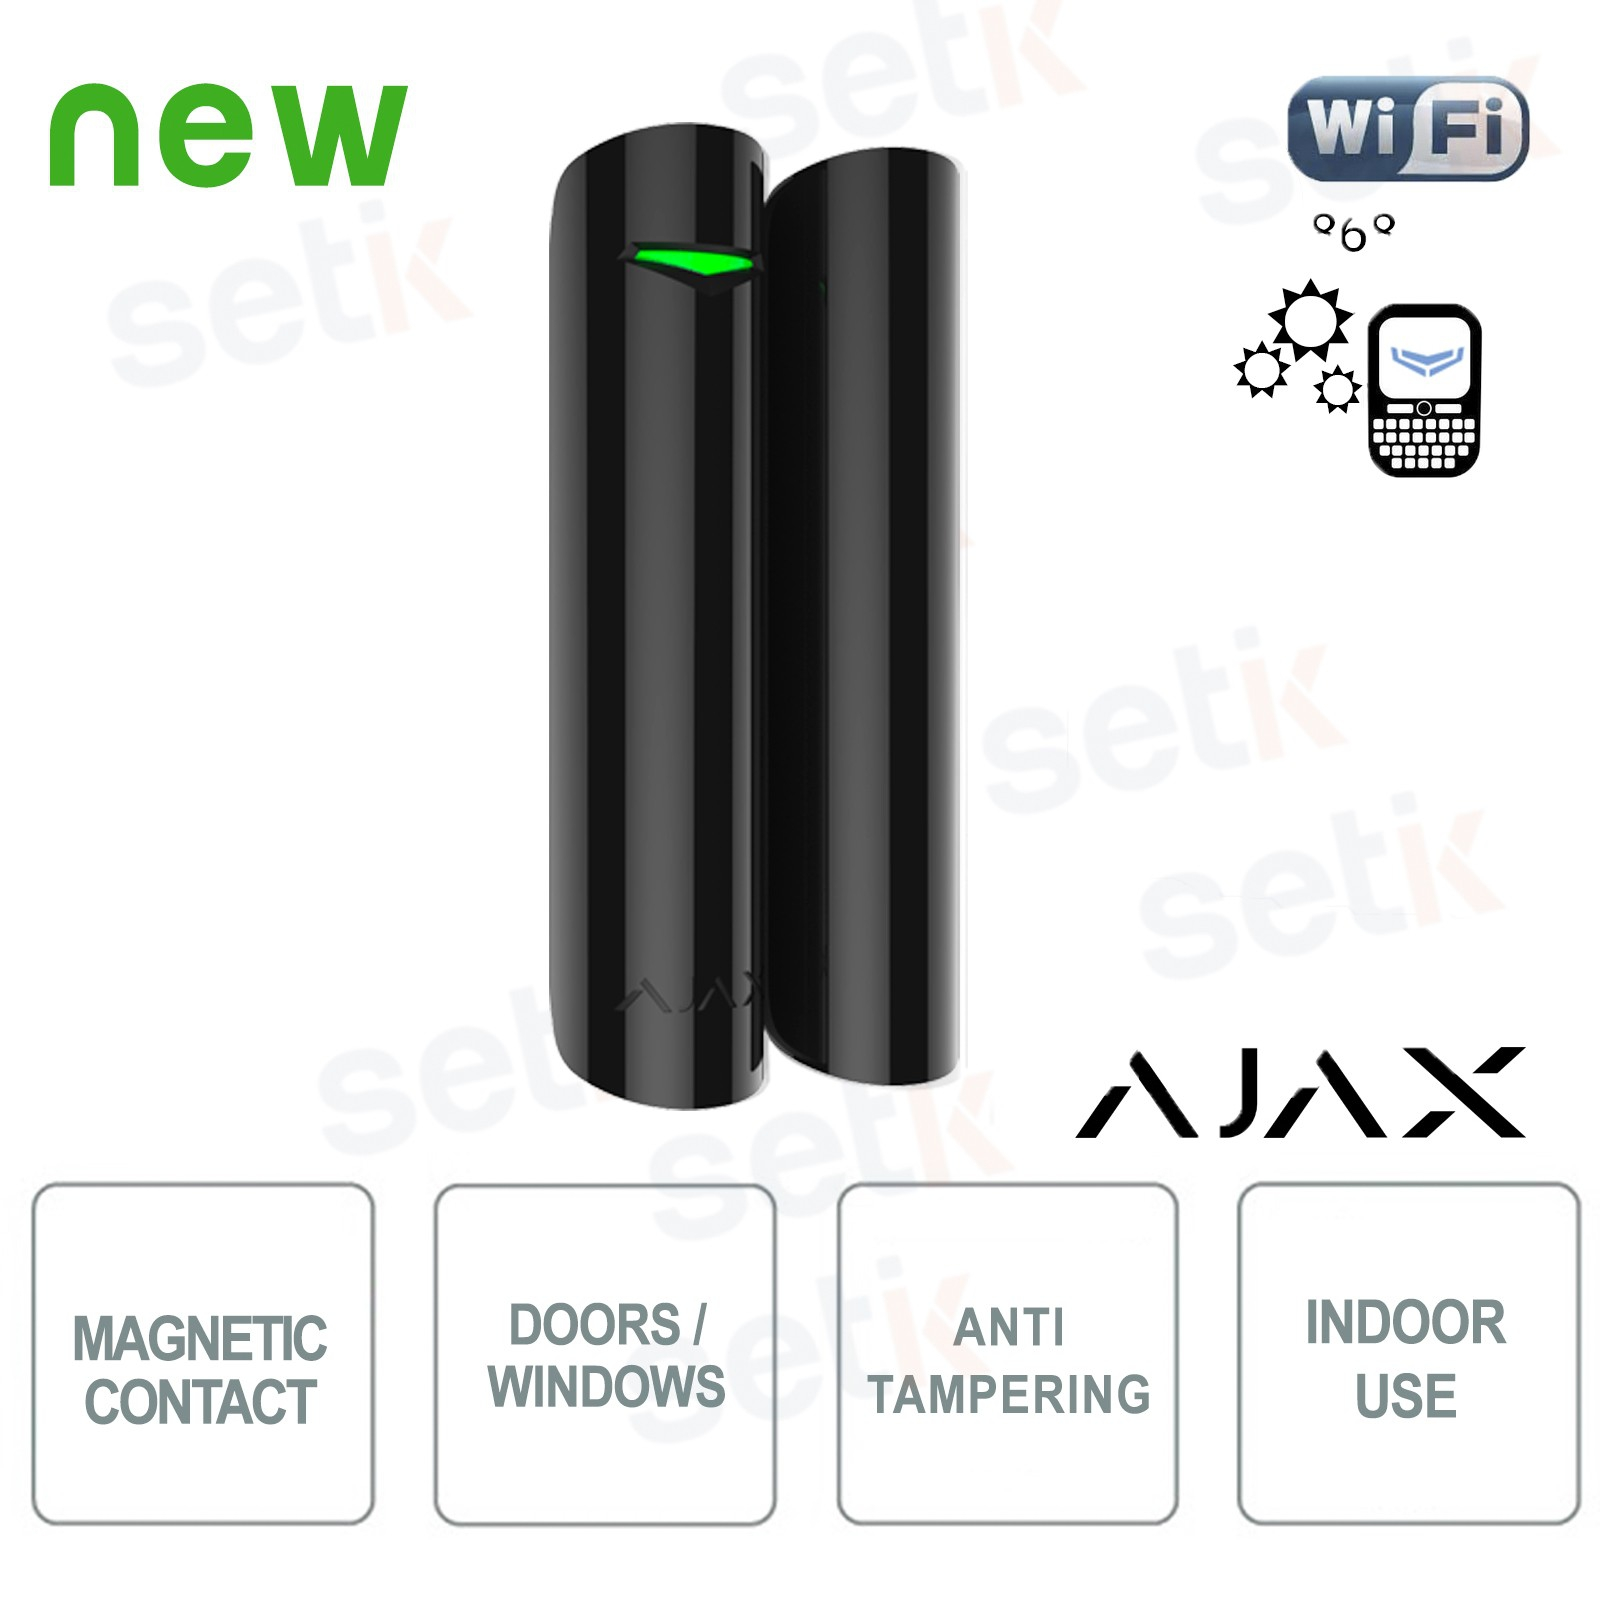 AJ-DOORPROTECT-B Ajax Contact magnétique alarme wireless porte//fenêtre  868Mhz